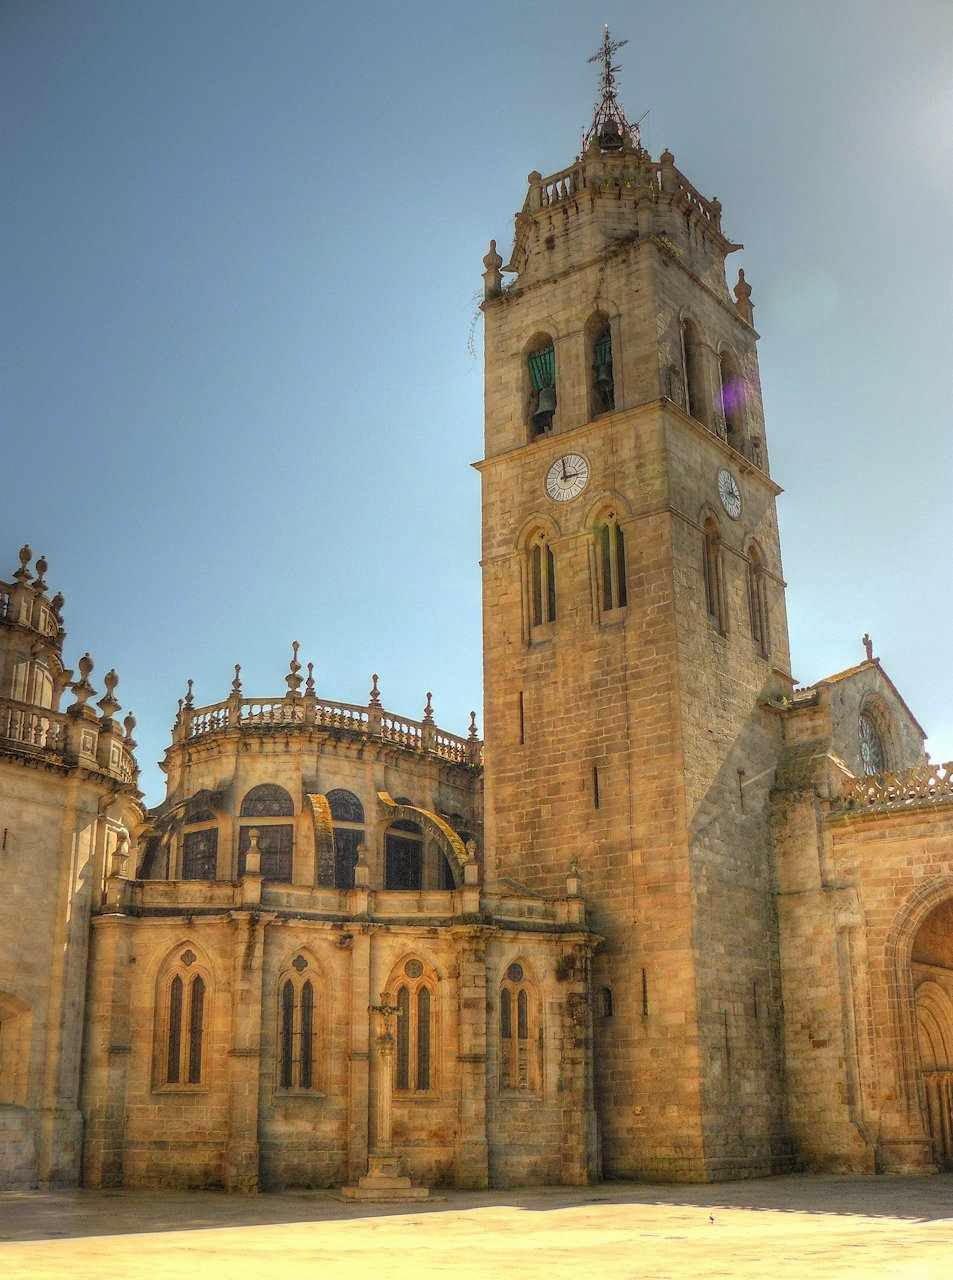 Aspectos exteriores da catedral de Lugo